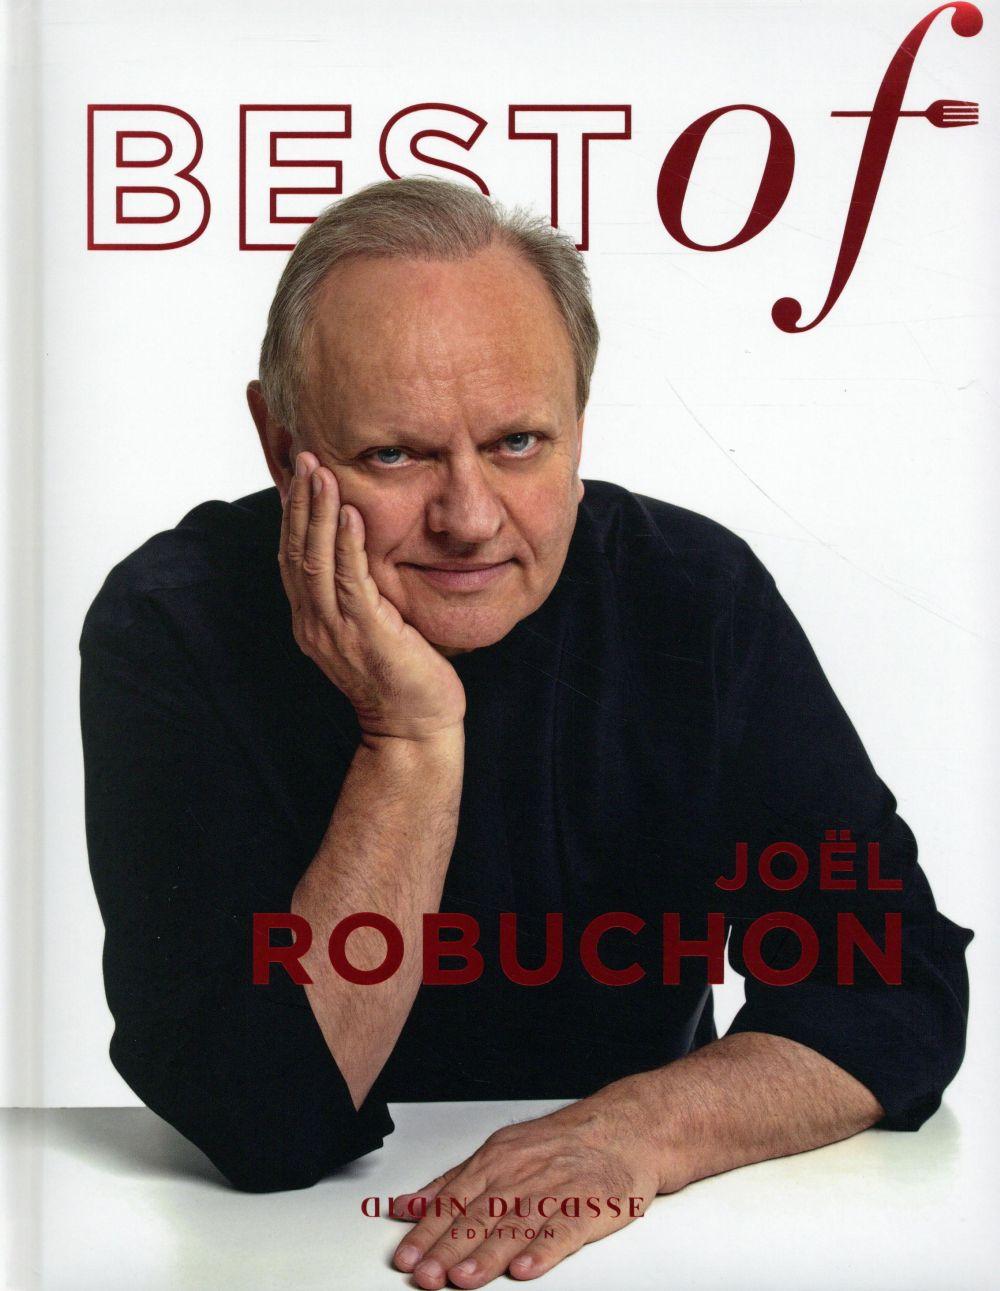 BEST OF JOEL ROBUCHON Robuchon Joël Ed. Alain Ducasse